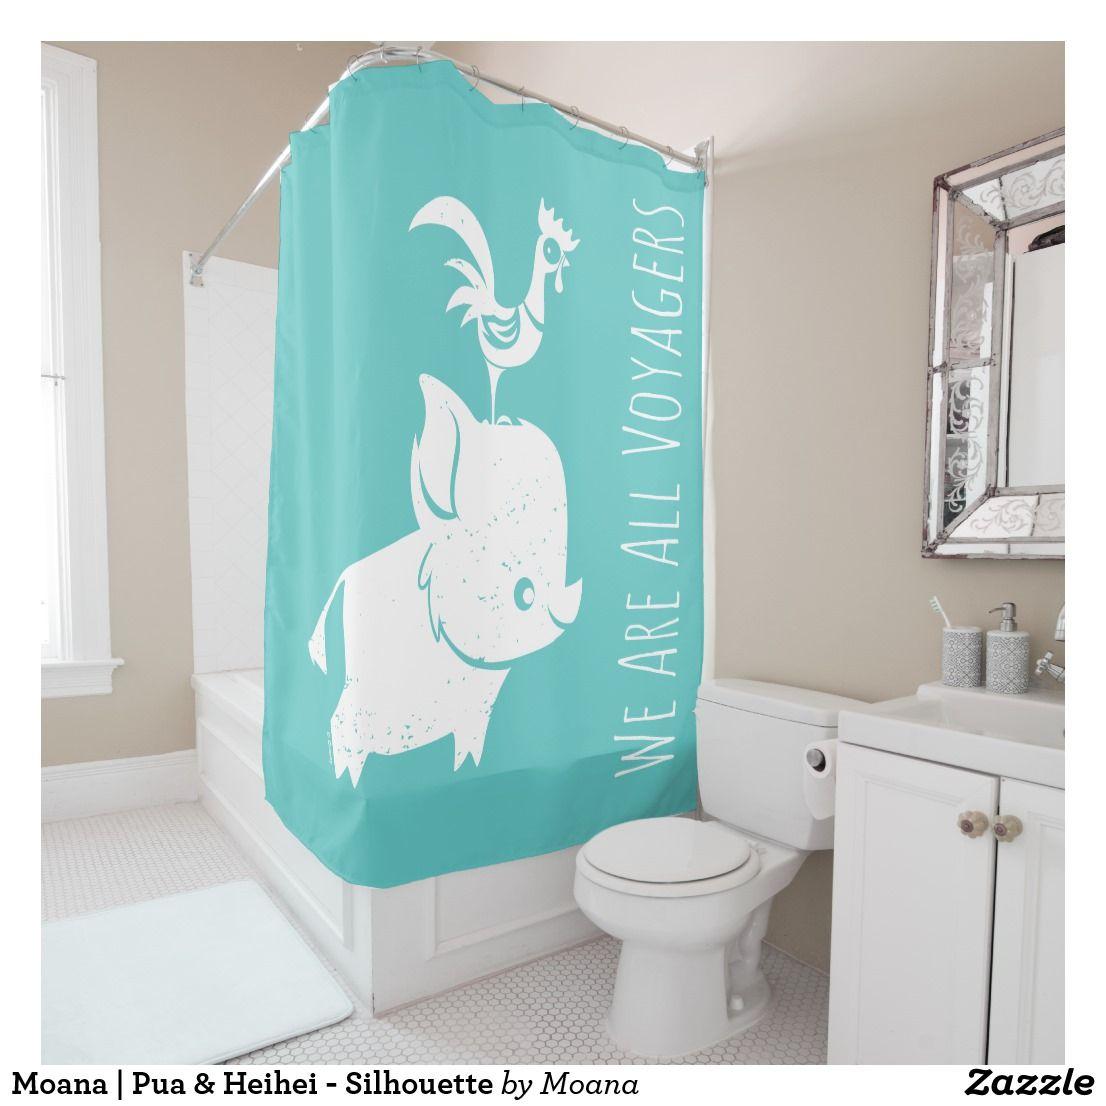 Moana Pua Heihei Silhouette Shower Curtain Zazzle Com Trendy Shower Curtain Printed Shower Curtain Bathroom Themes